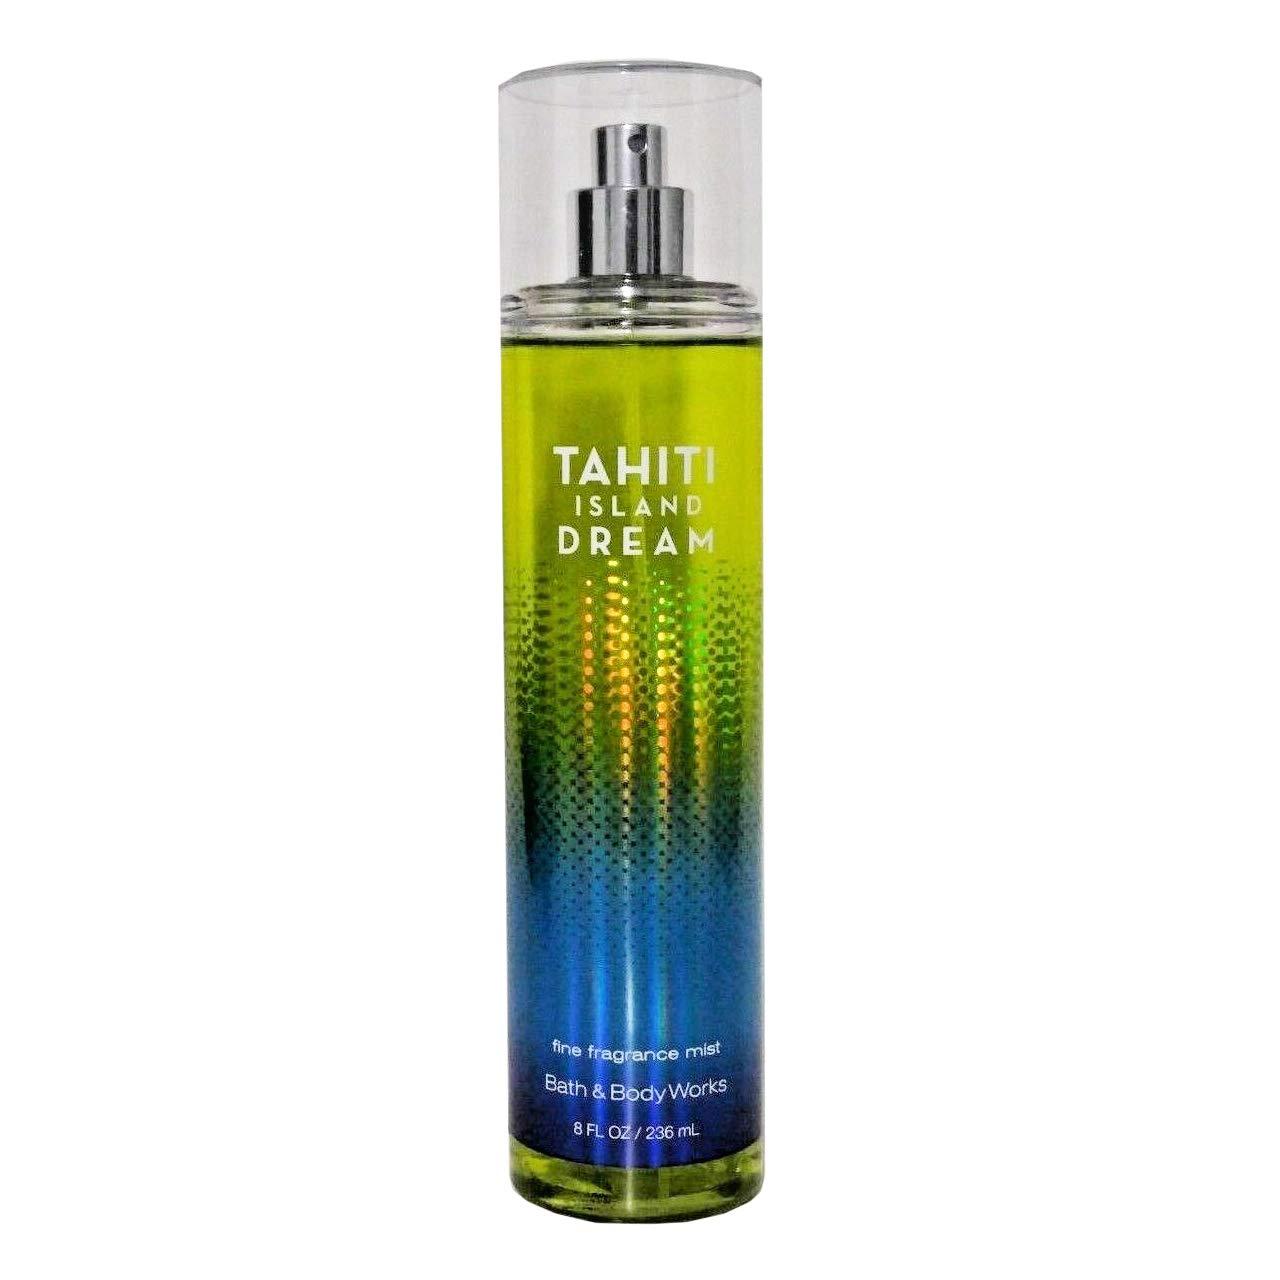 Bath and Body Works Tahiti Island High material 8 Fine Mist Dream Ou Fragrance Limited time cheap sale